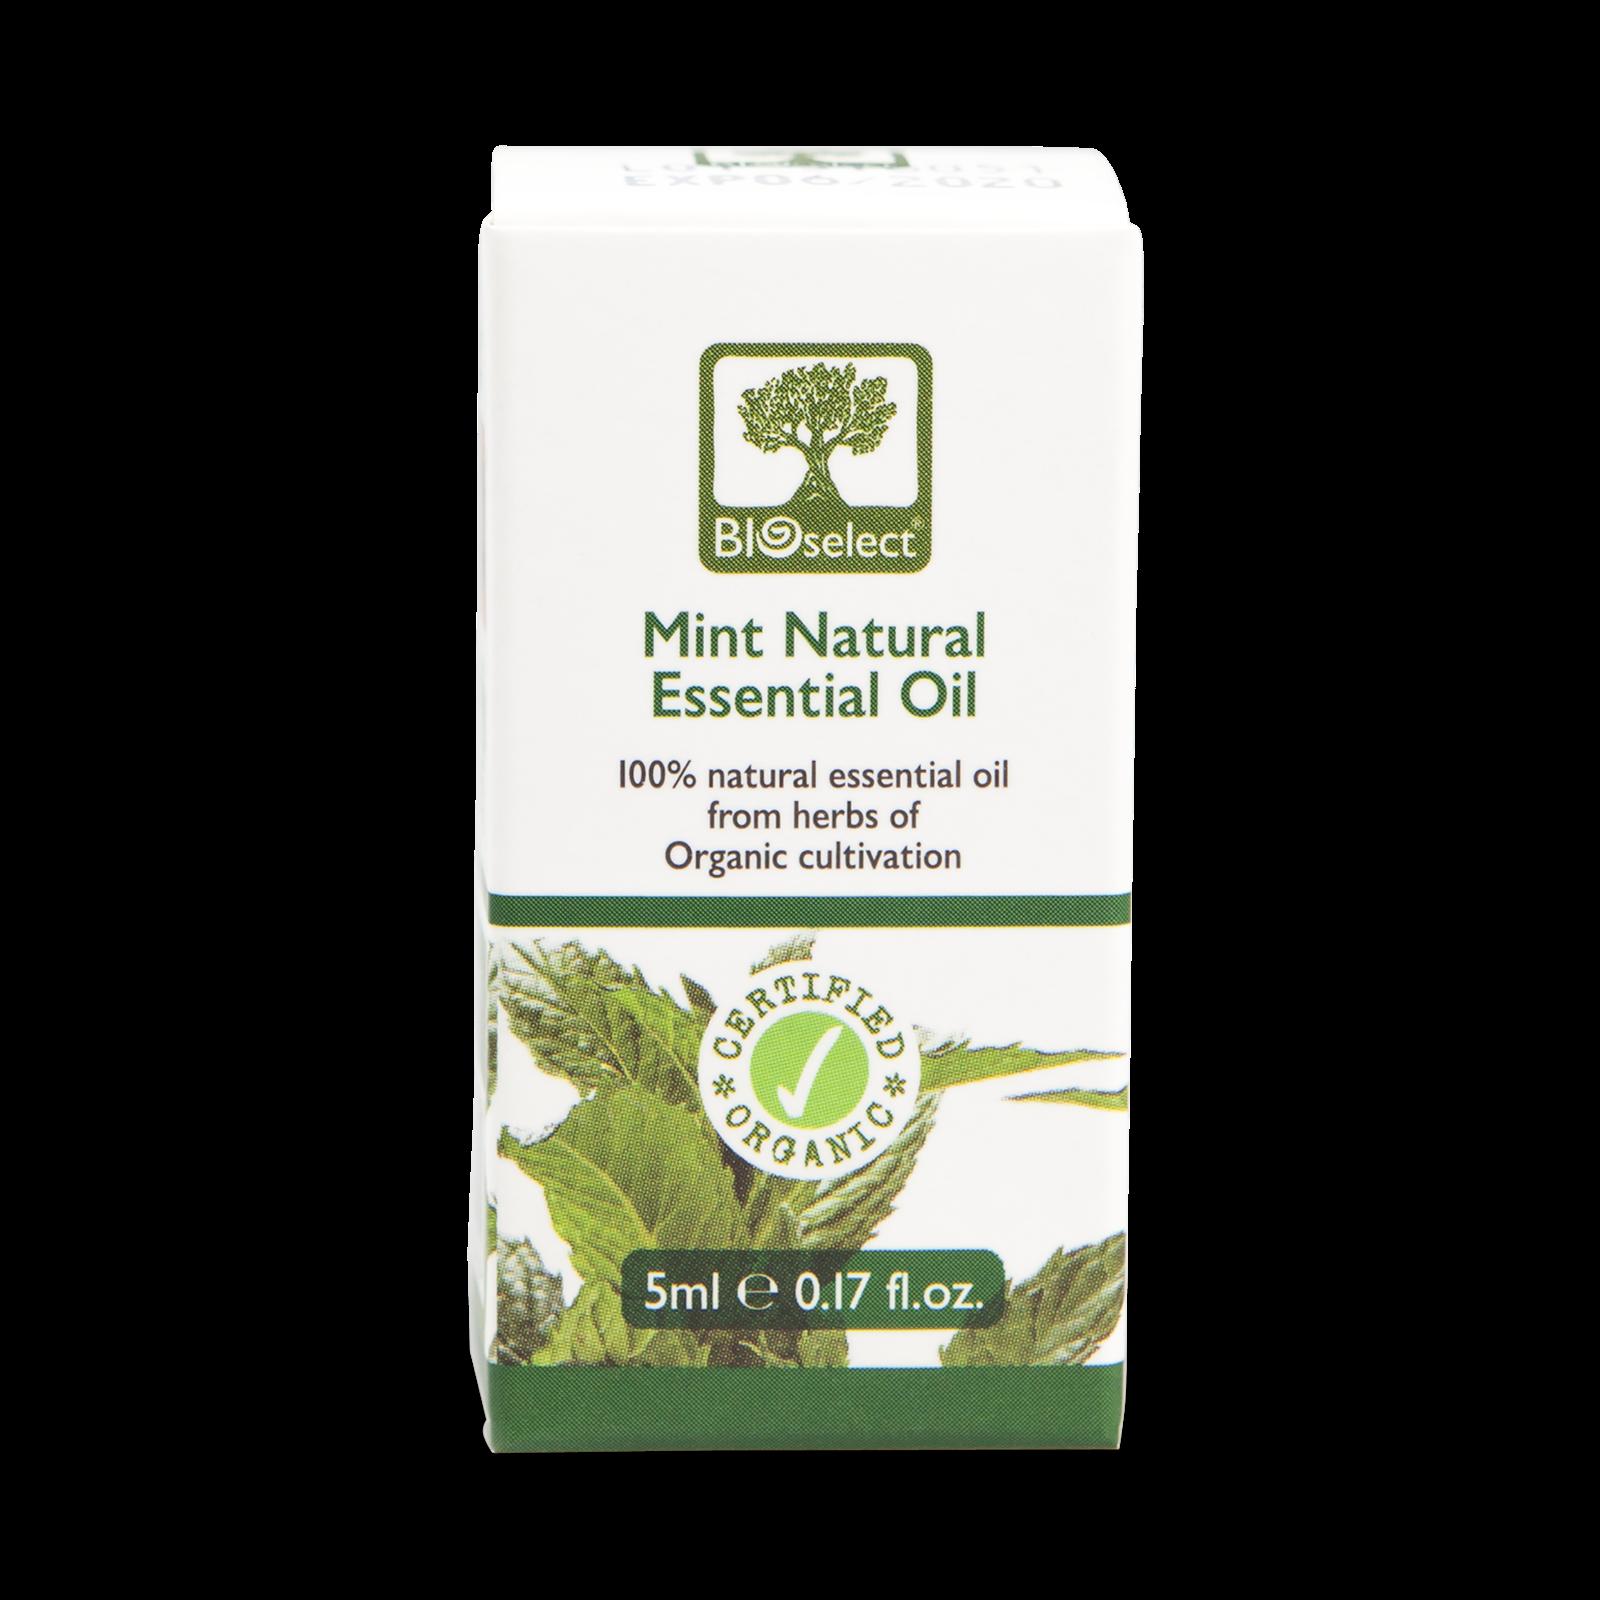 Bioselect Mint Natural Essential Oil Certified Organic